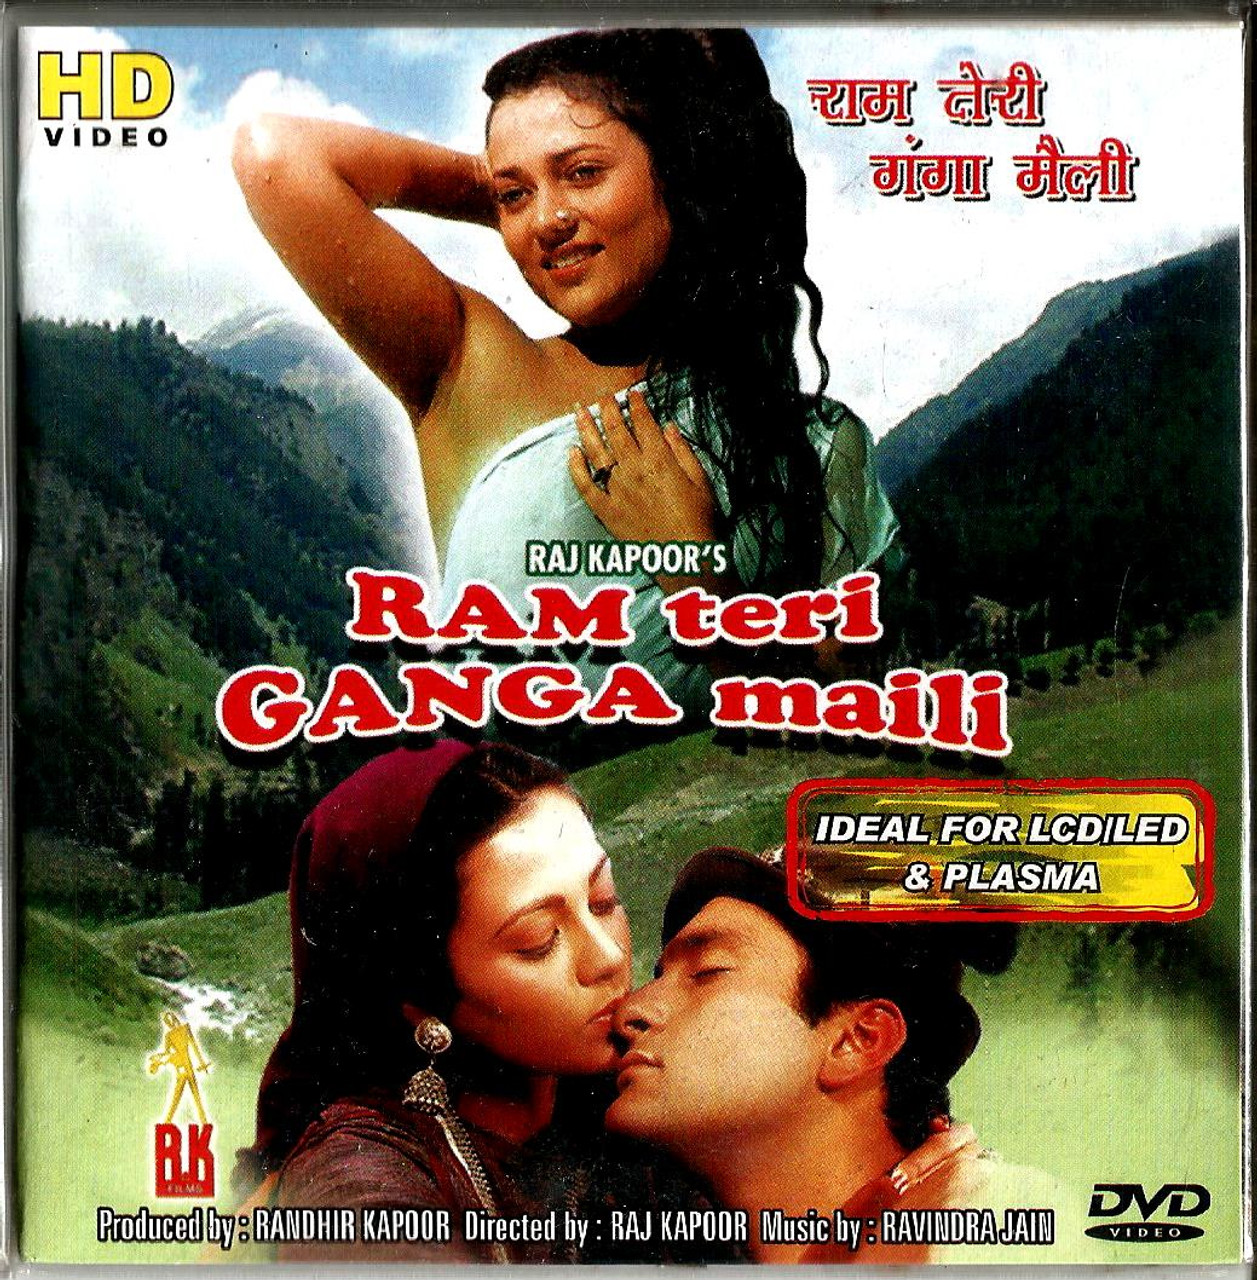 Ram teri ganga maili picture film